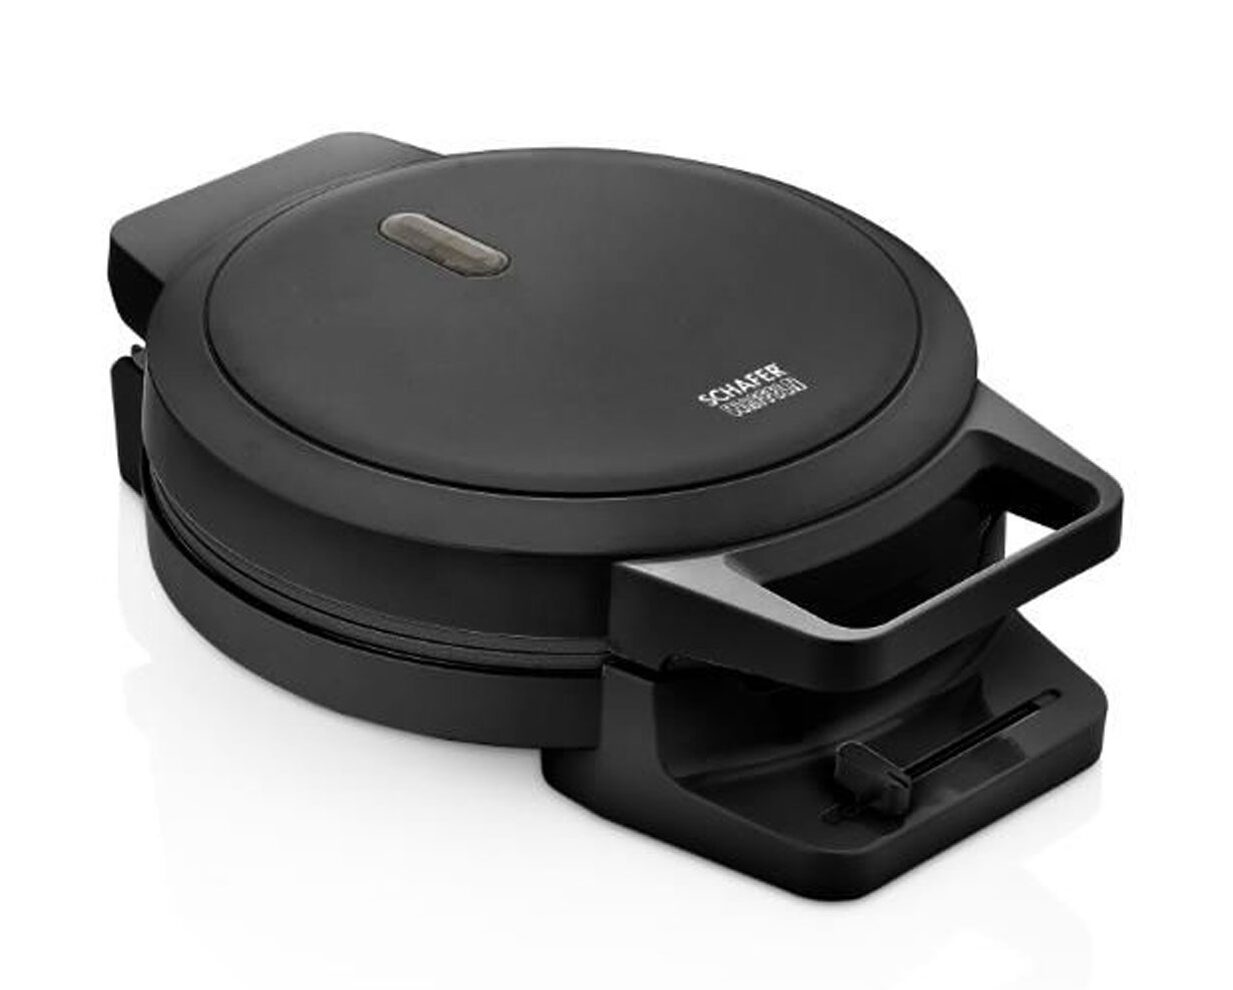 lezzetli-waffle-lar-hazirlayabileceginiz-en-iyi-5-waffle-makines